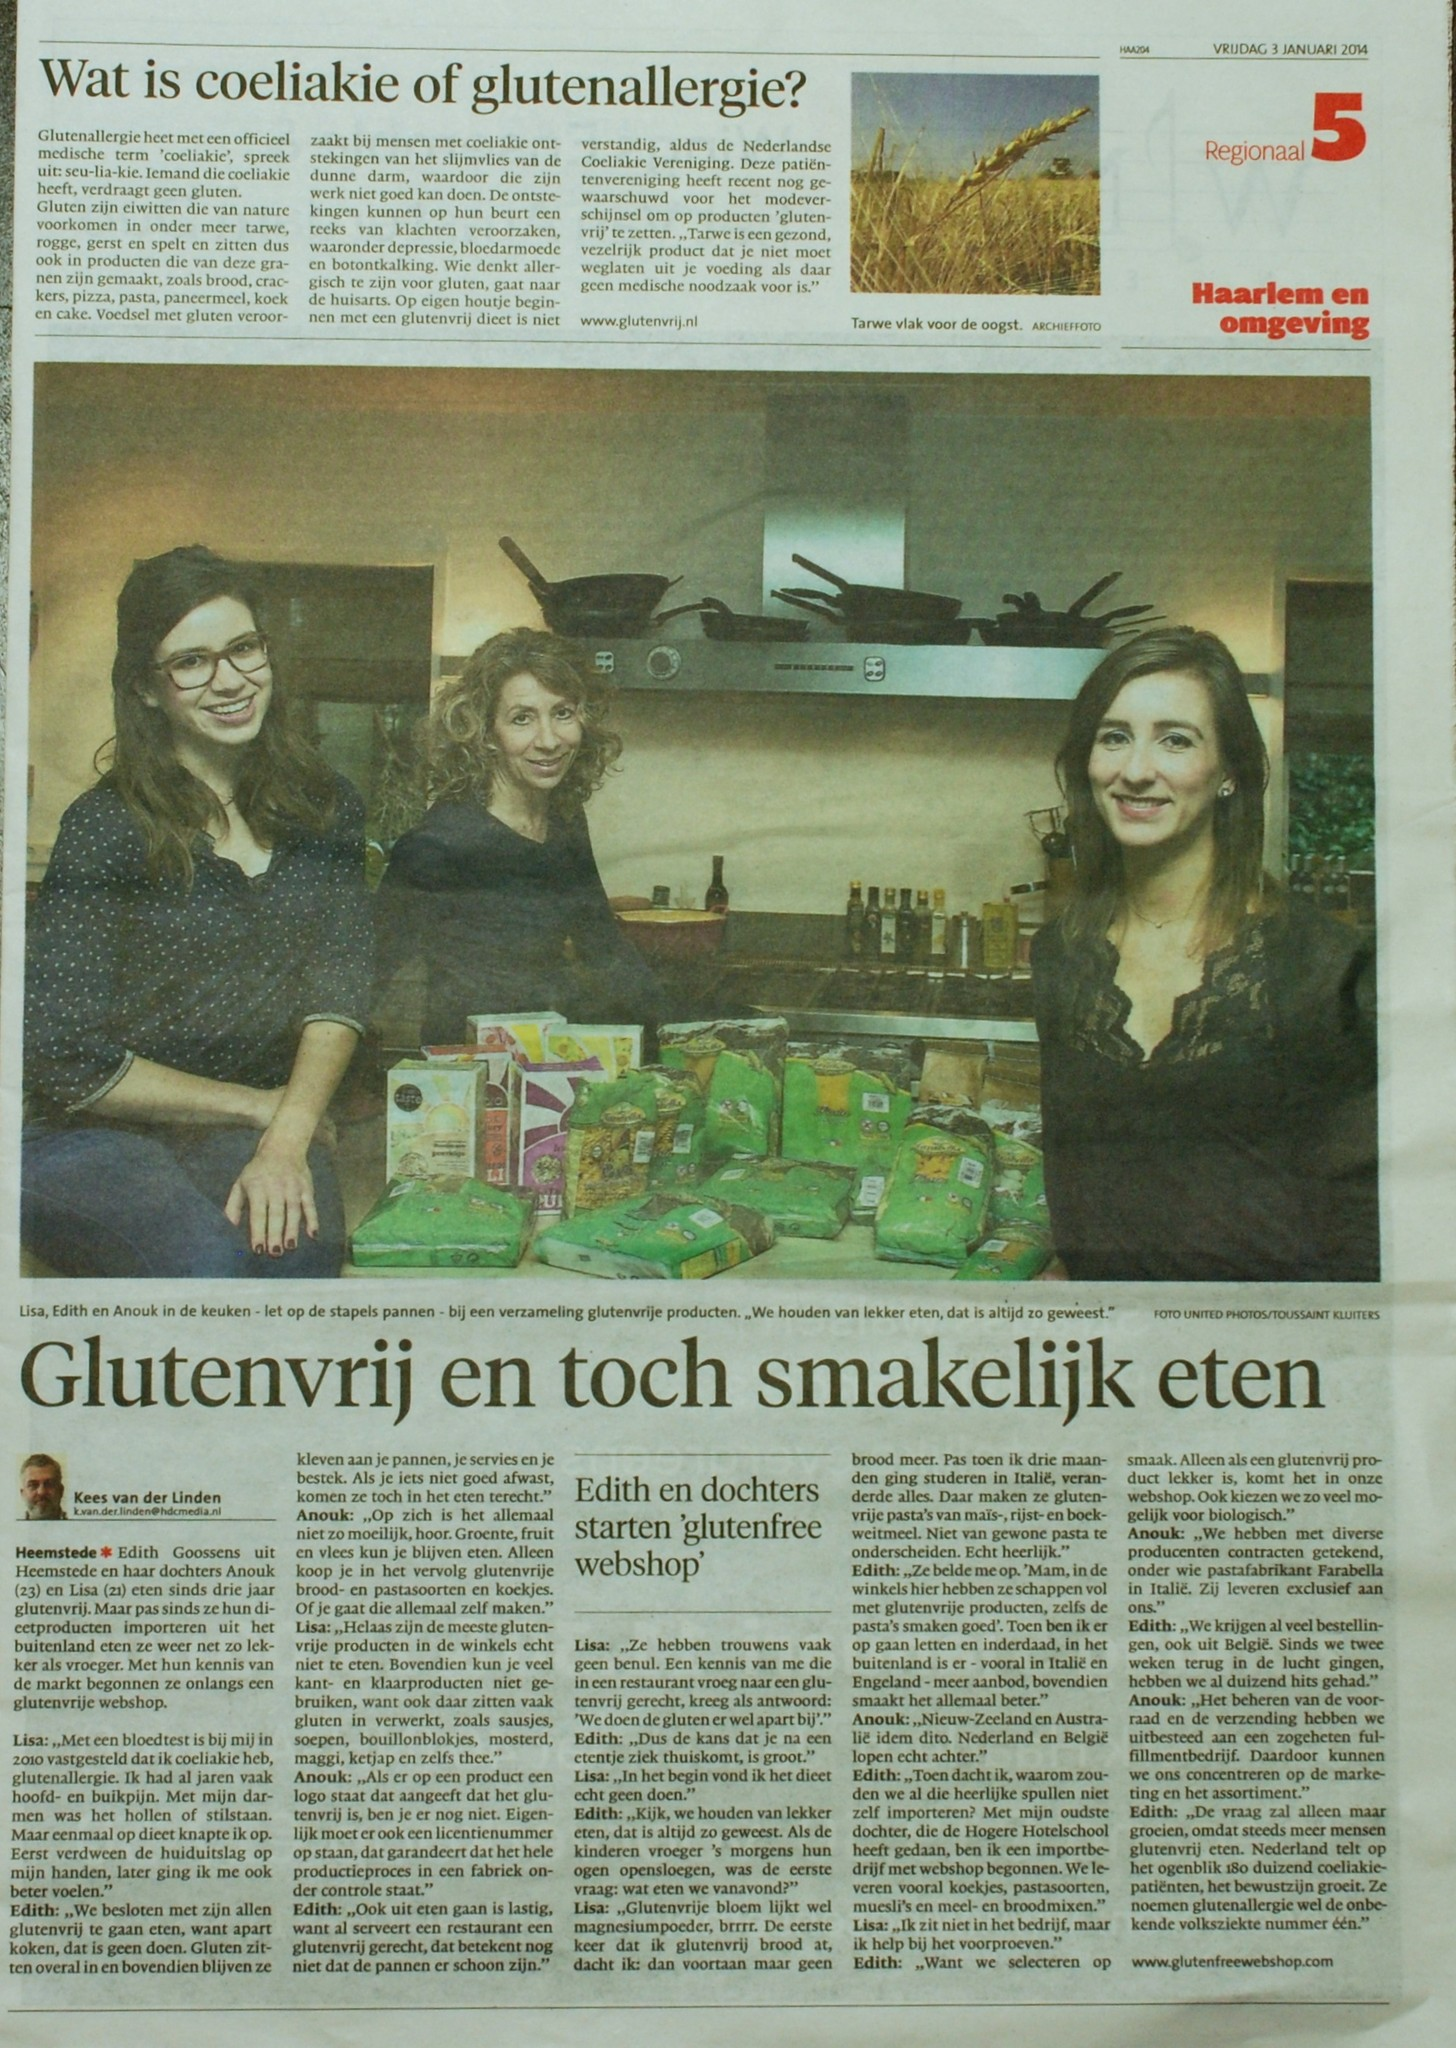 Artikel Glutenfreewebshop.com in HD